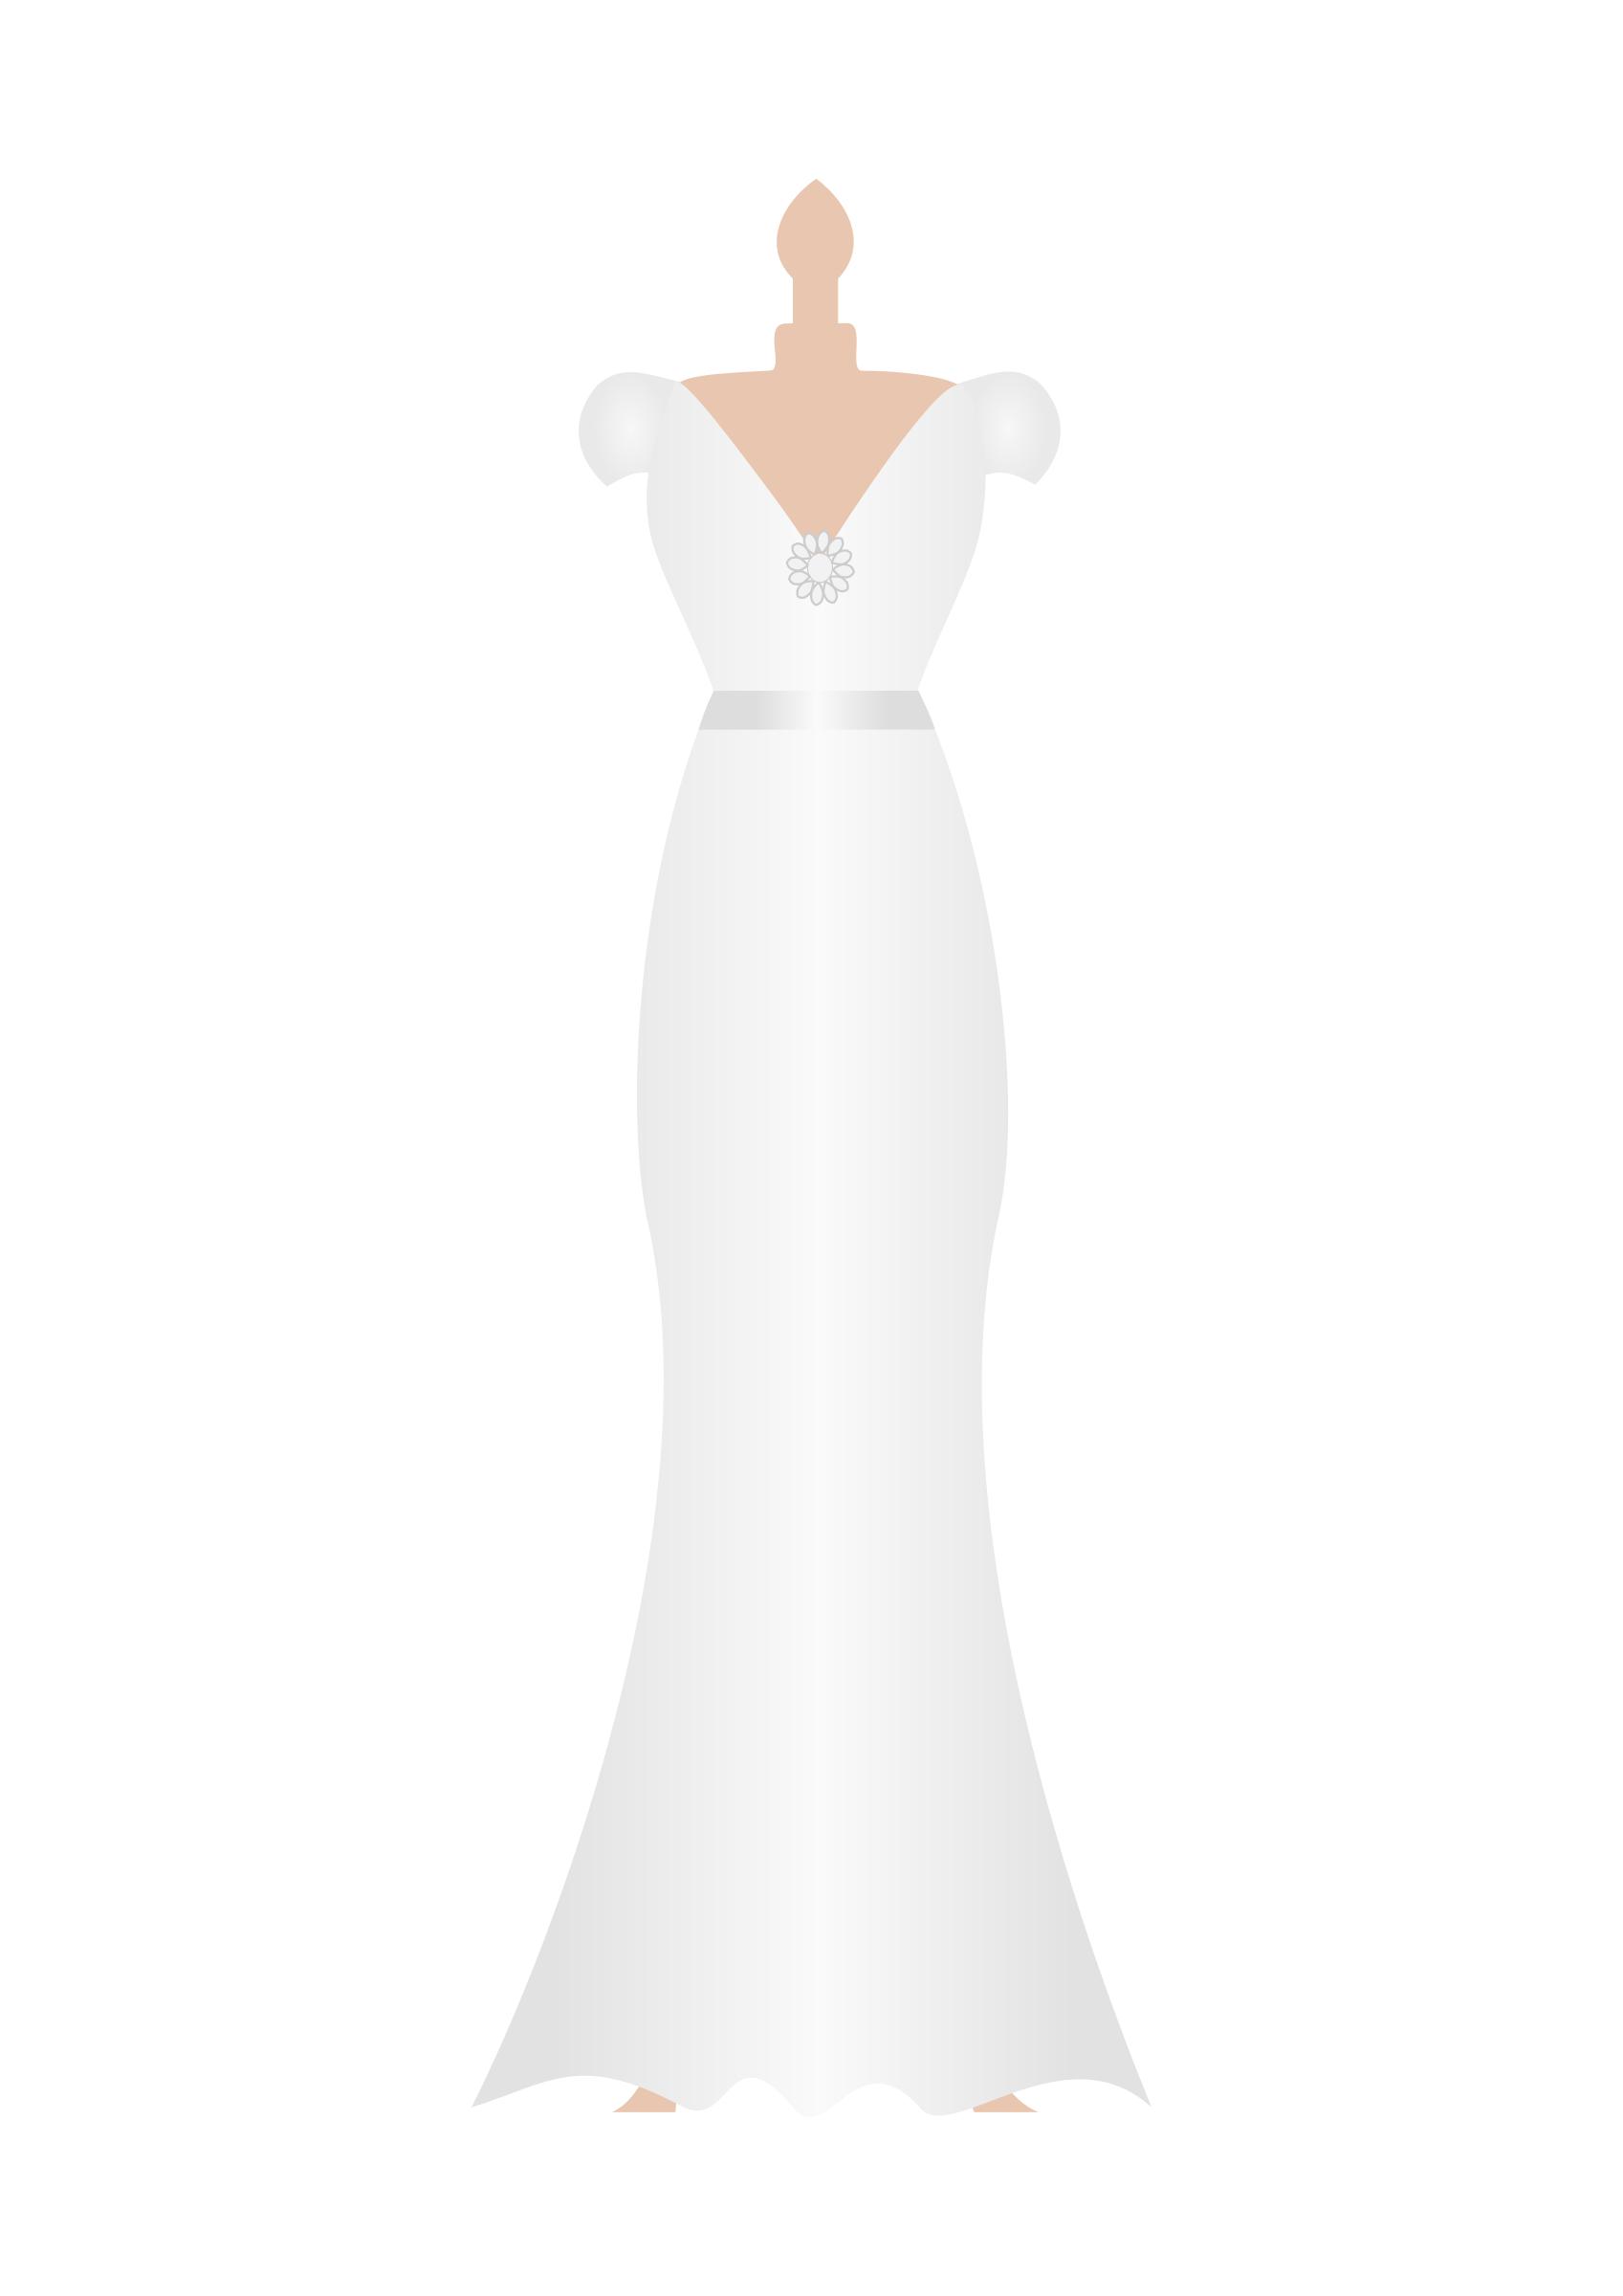 Wedding Dress And Tux PNG Transparent Wedding Dress And Tux.